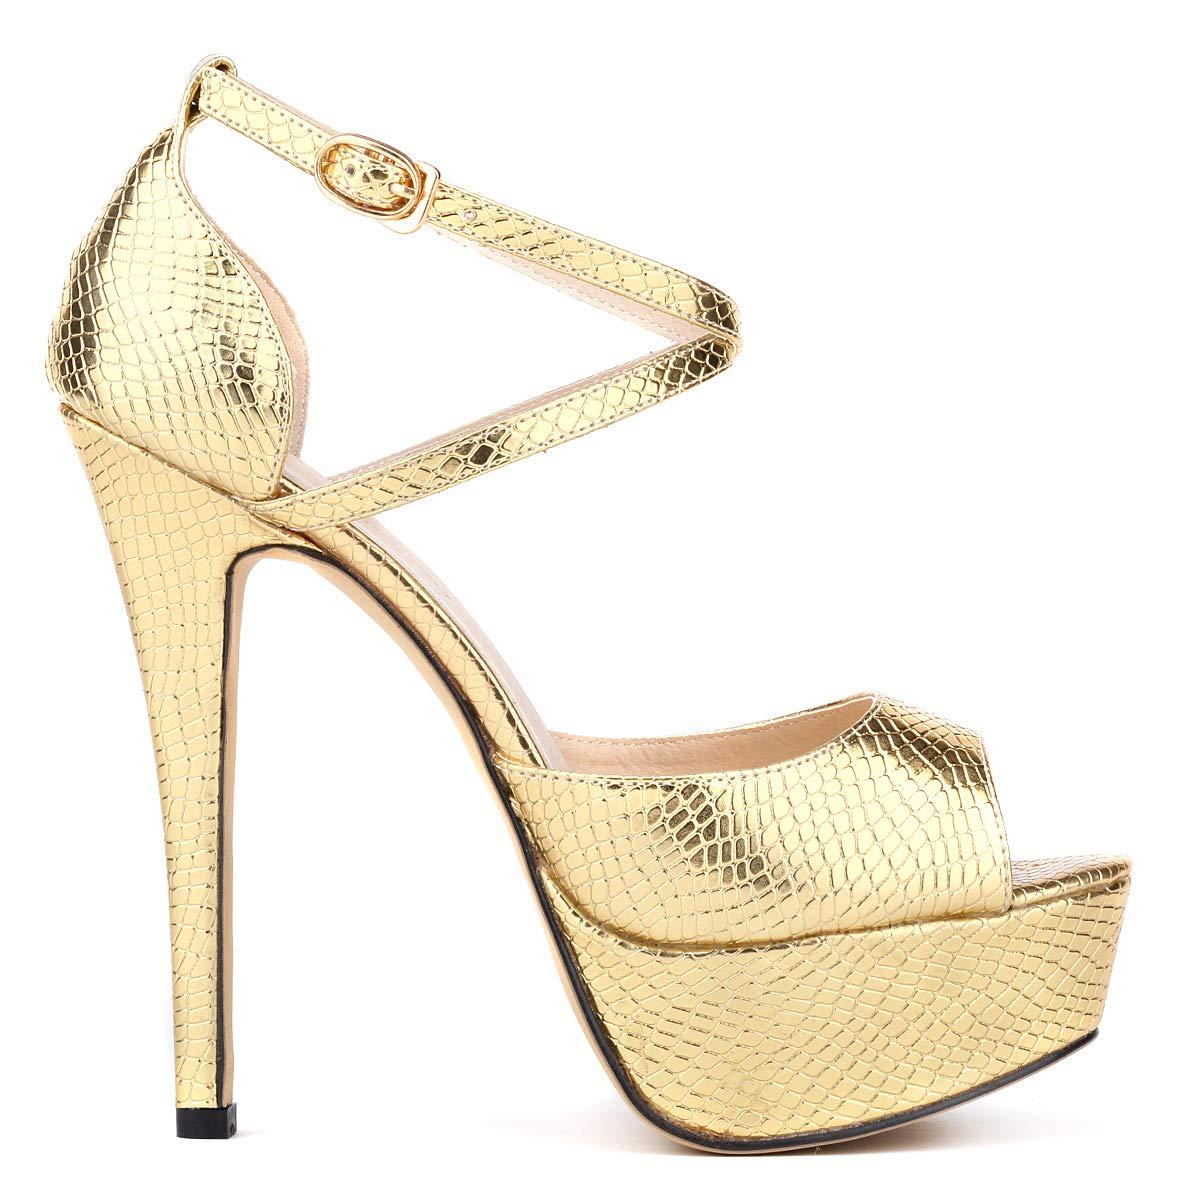 gold Women's Peep Toe Platform Stiletto High Heel Ankle Crisscross Strap Buckle Snap Dress Party Heeled Sandals